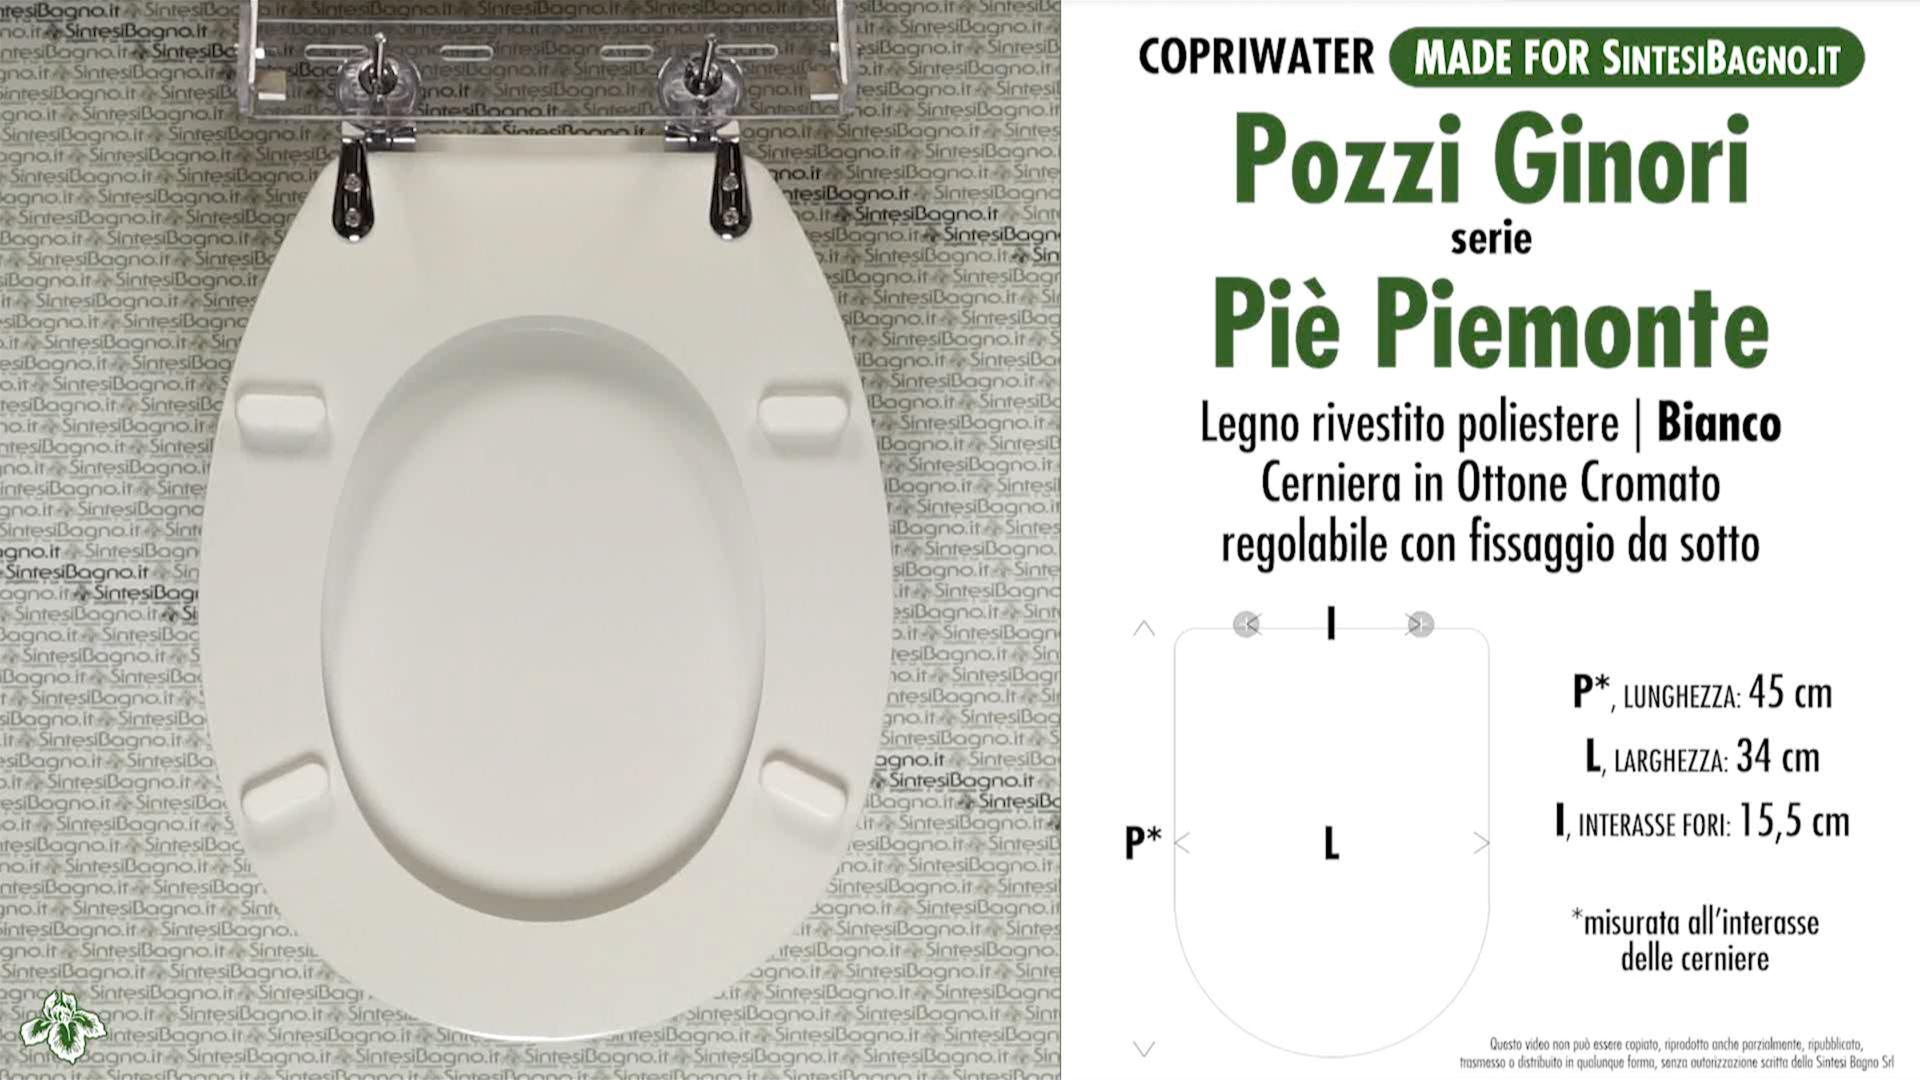 SCHEDA TECNICA MISURE copriwater POZZI GINORI PIE' PIEMONTE PIEMONTESINA